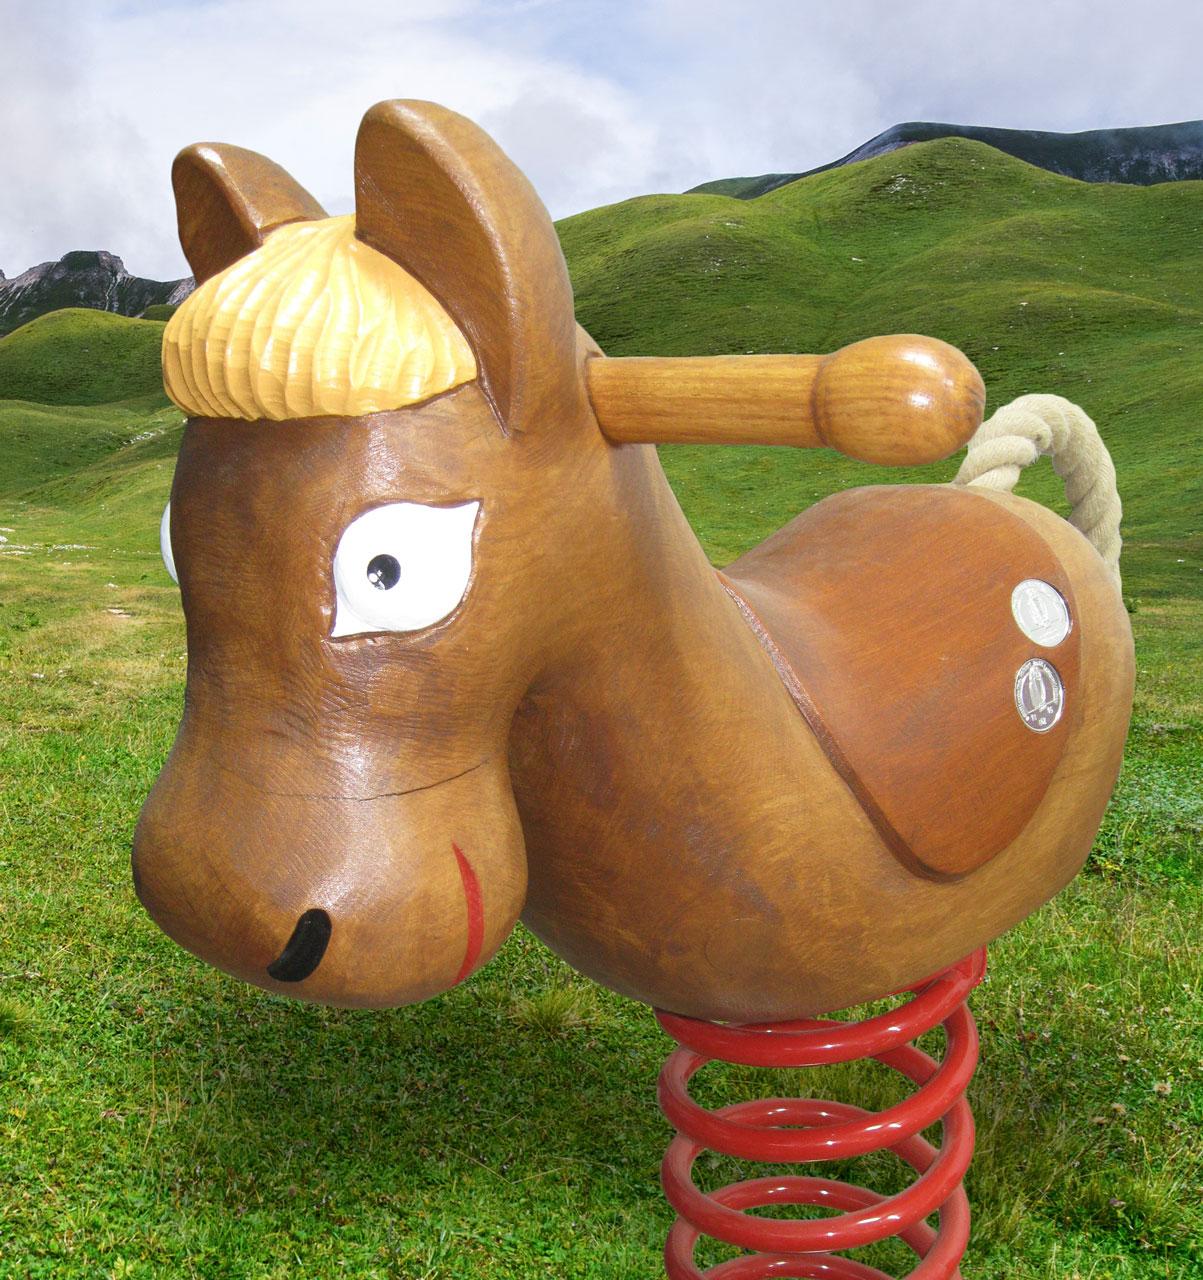 P 5-4 Federwipper Pferd Pferdchen | Wackelpferd